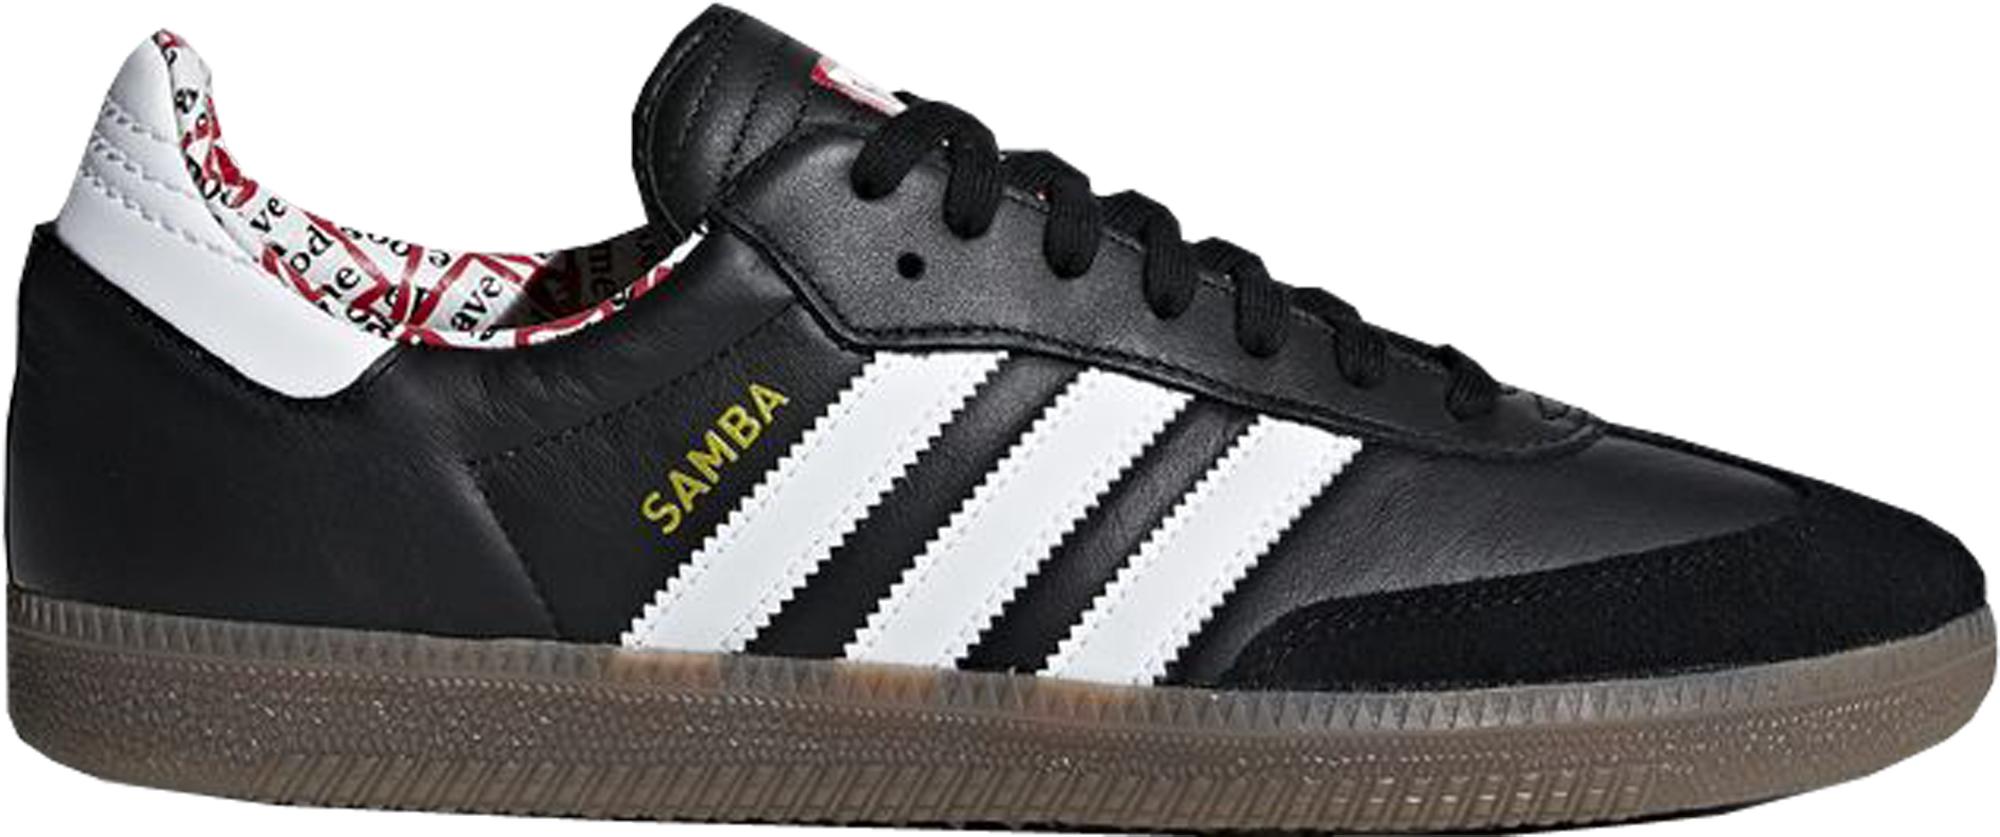 adidas Samba Have A Good Time